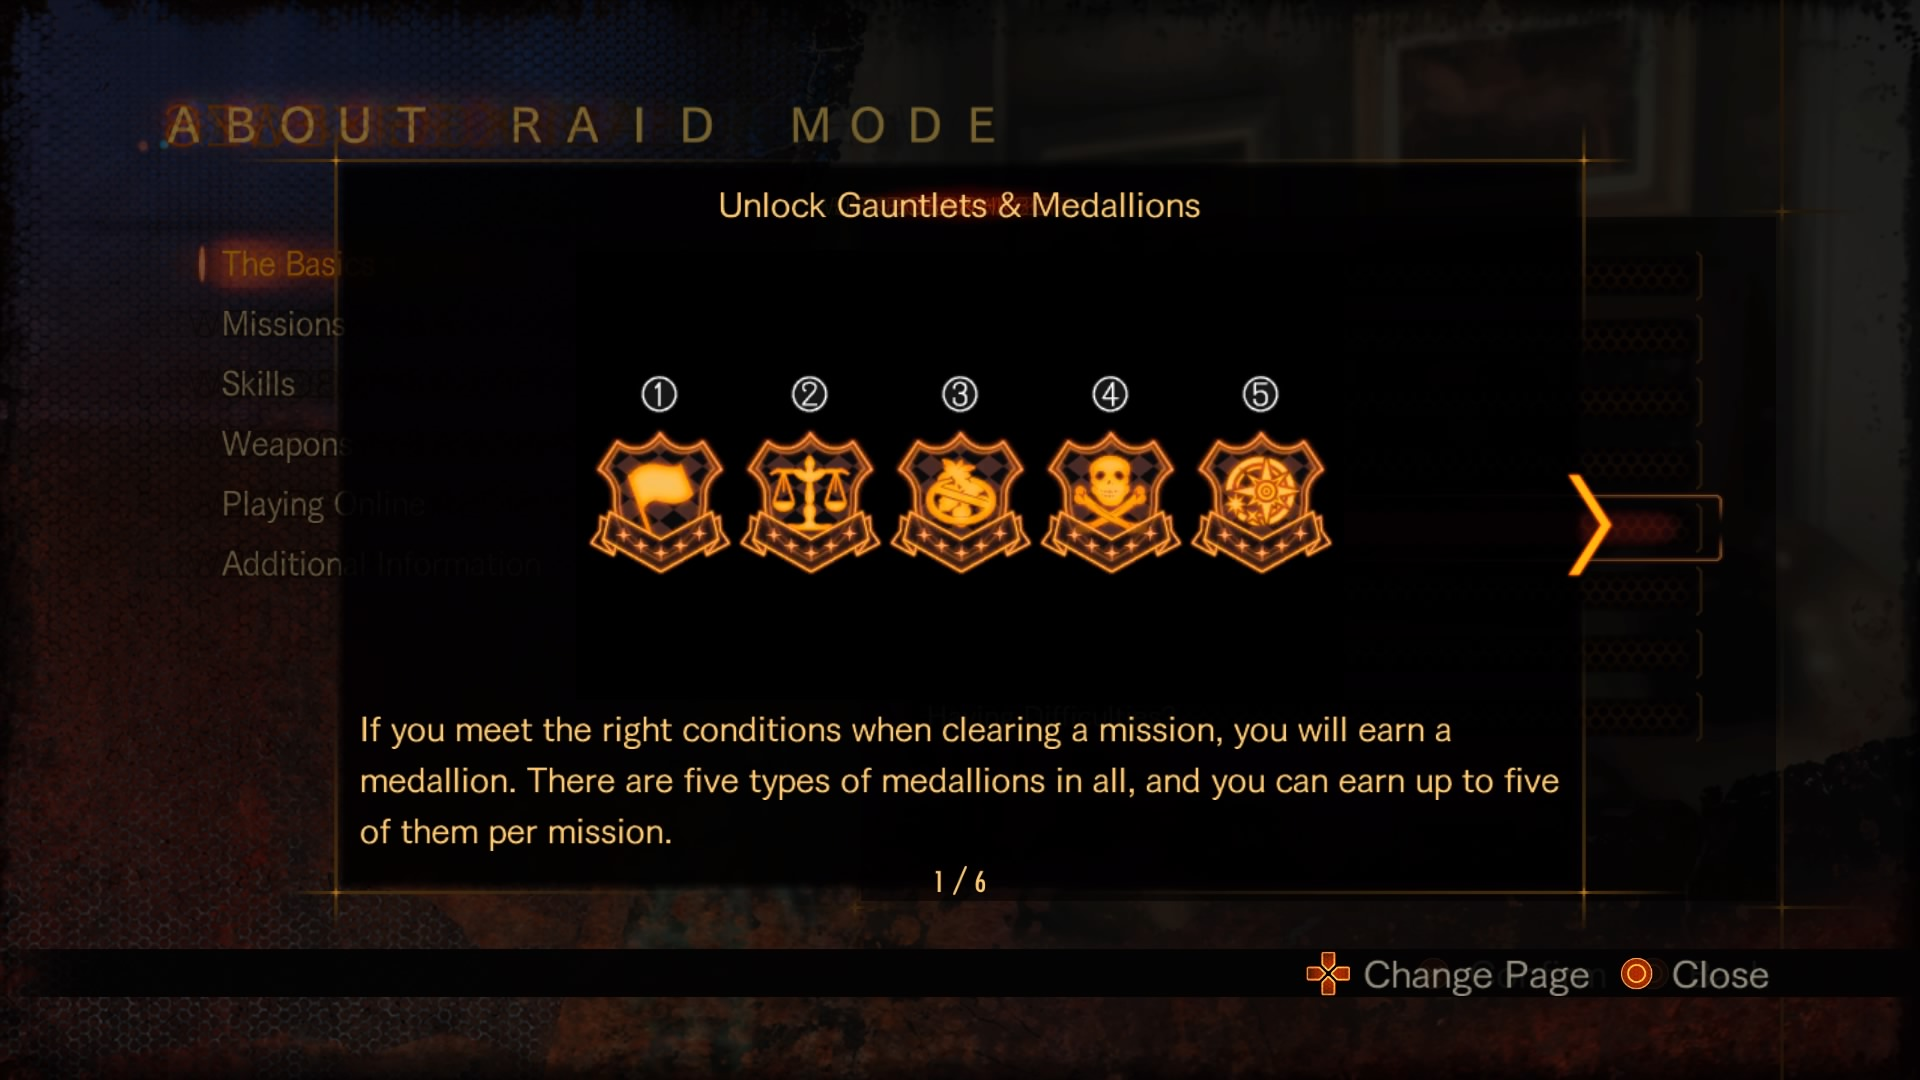 Unlock Gauntlets & Medallions